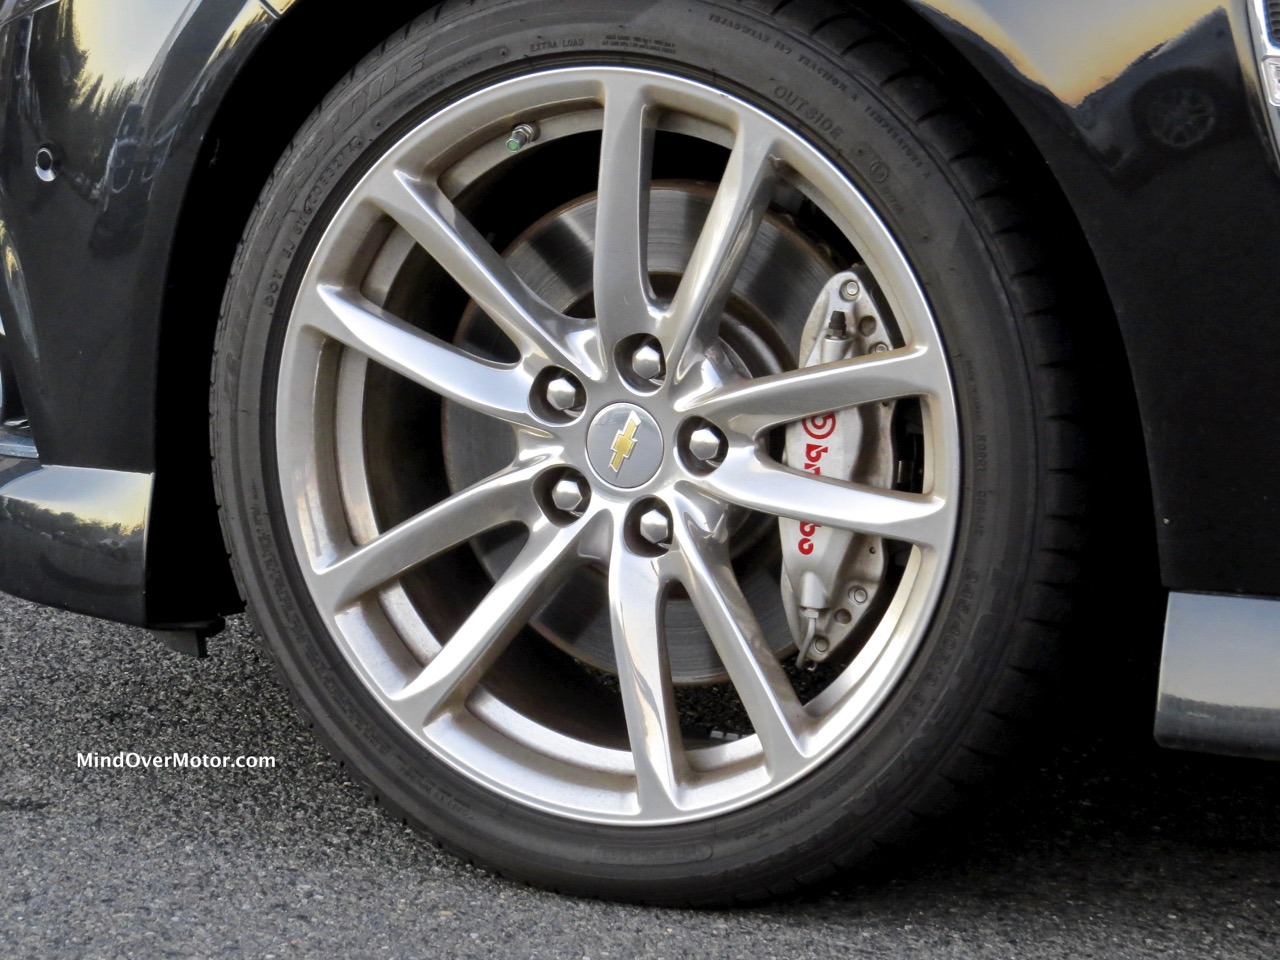 2014 Chevrolet SS Rim